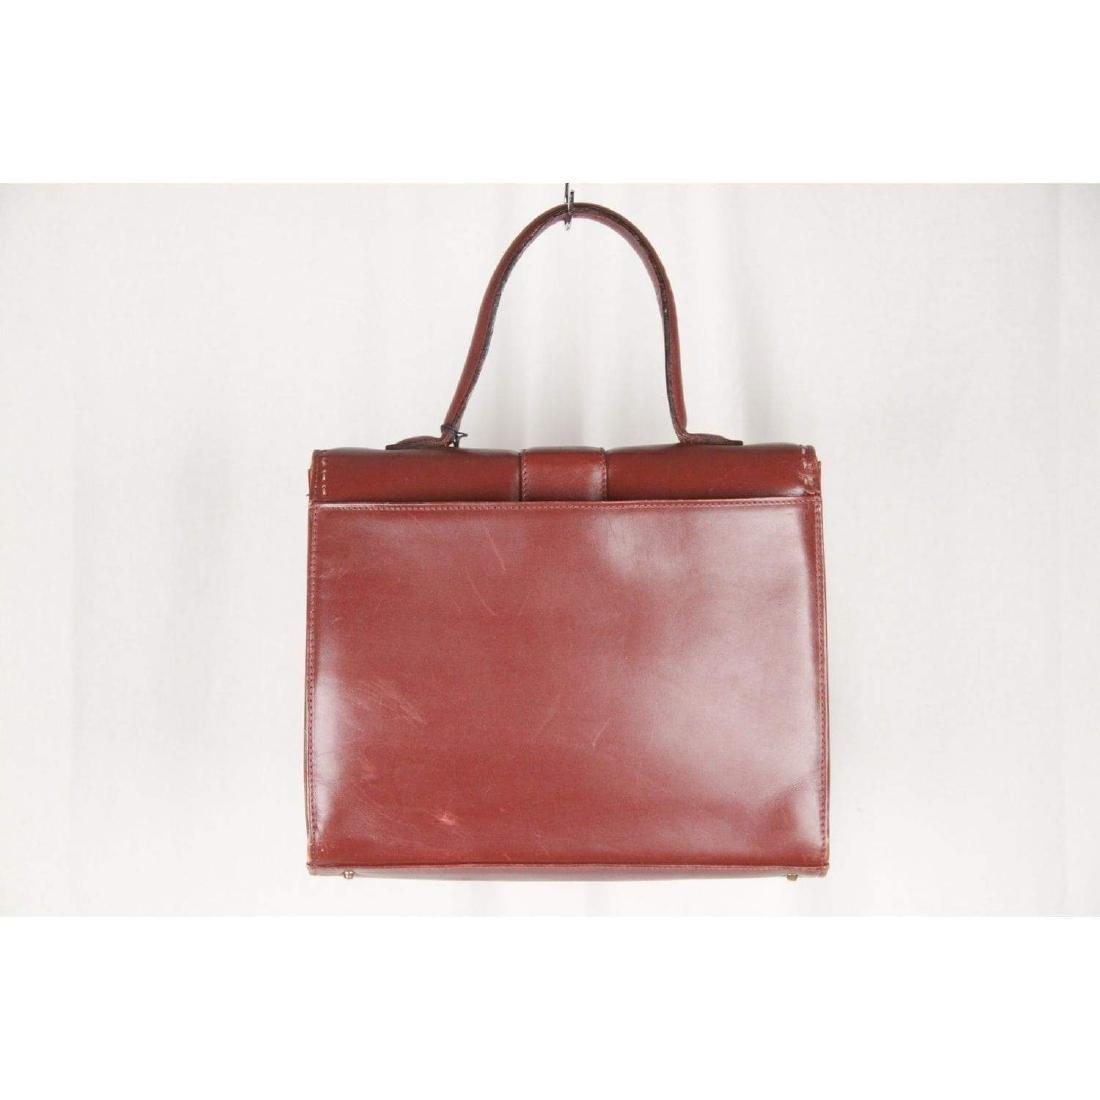 MONTENAPOLEONE Vintage Brown Leather HANDBAG - 5